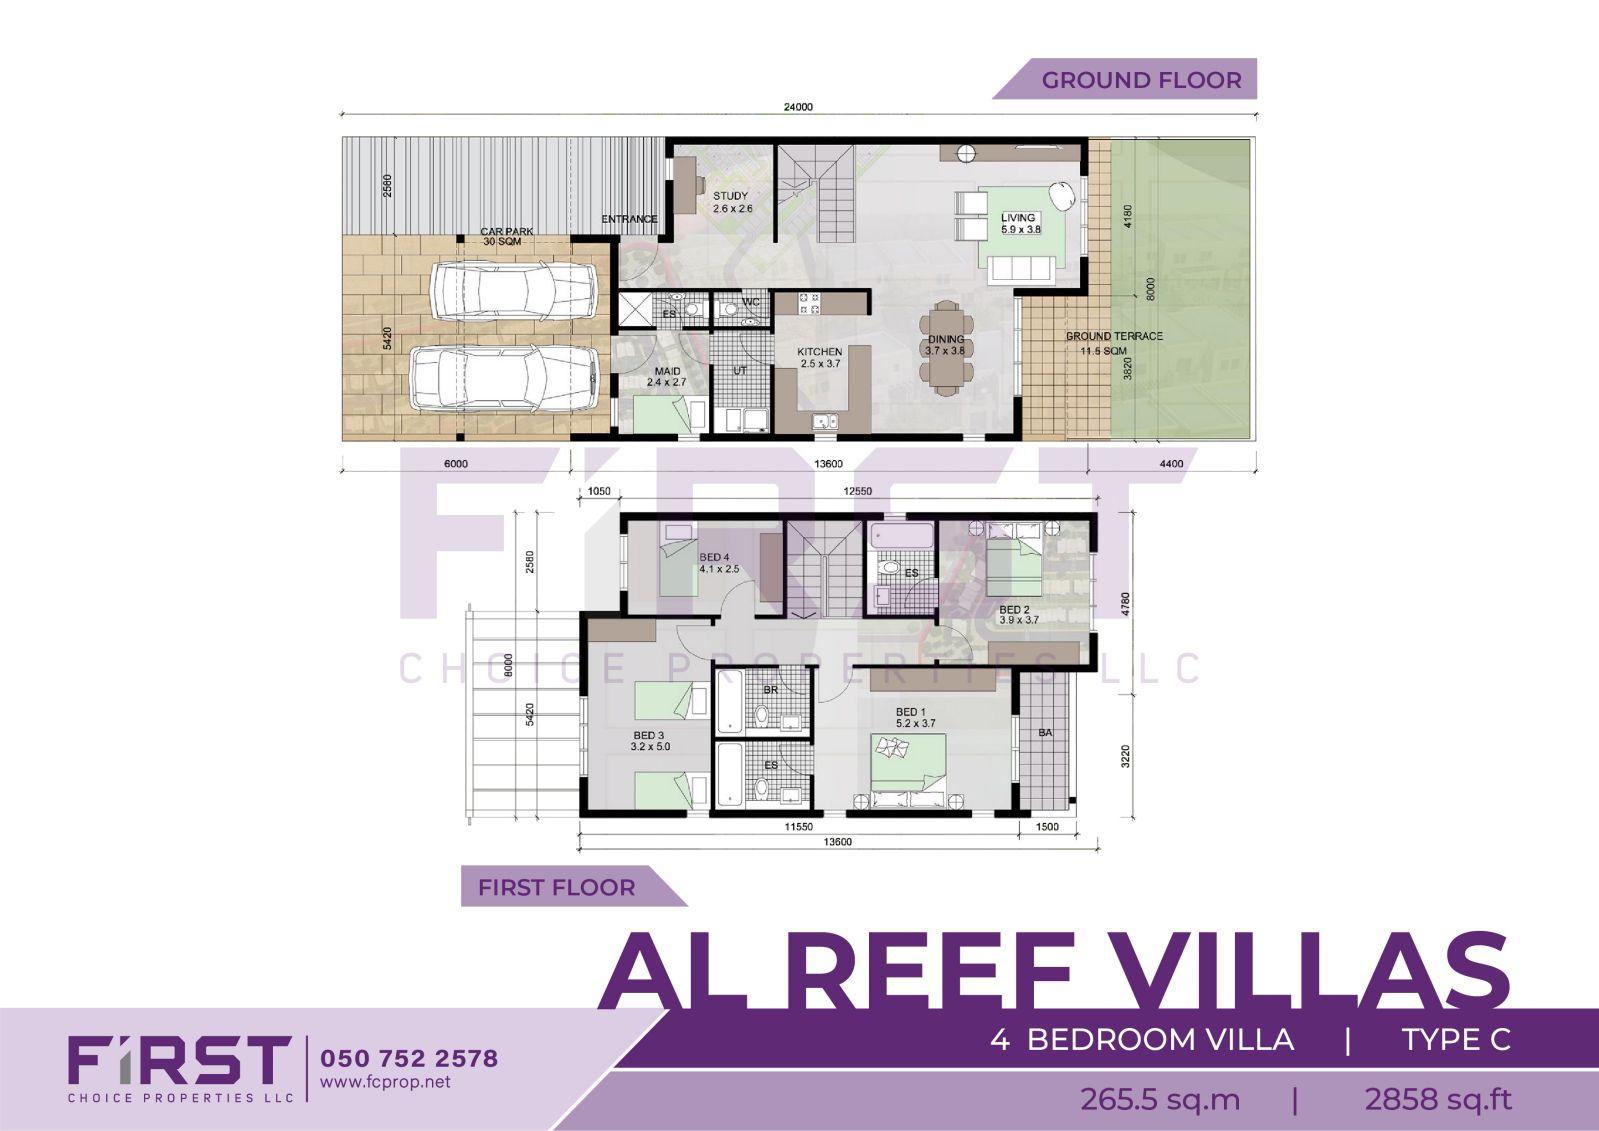 Al Reef Abu Dhabi Al Reef Villas 4 Bedroom Villa Type C 265.5 sq.m 2858 sq.ft.jpg